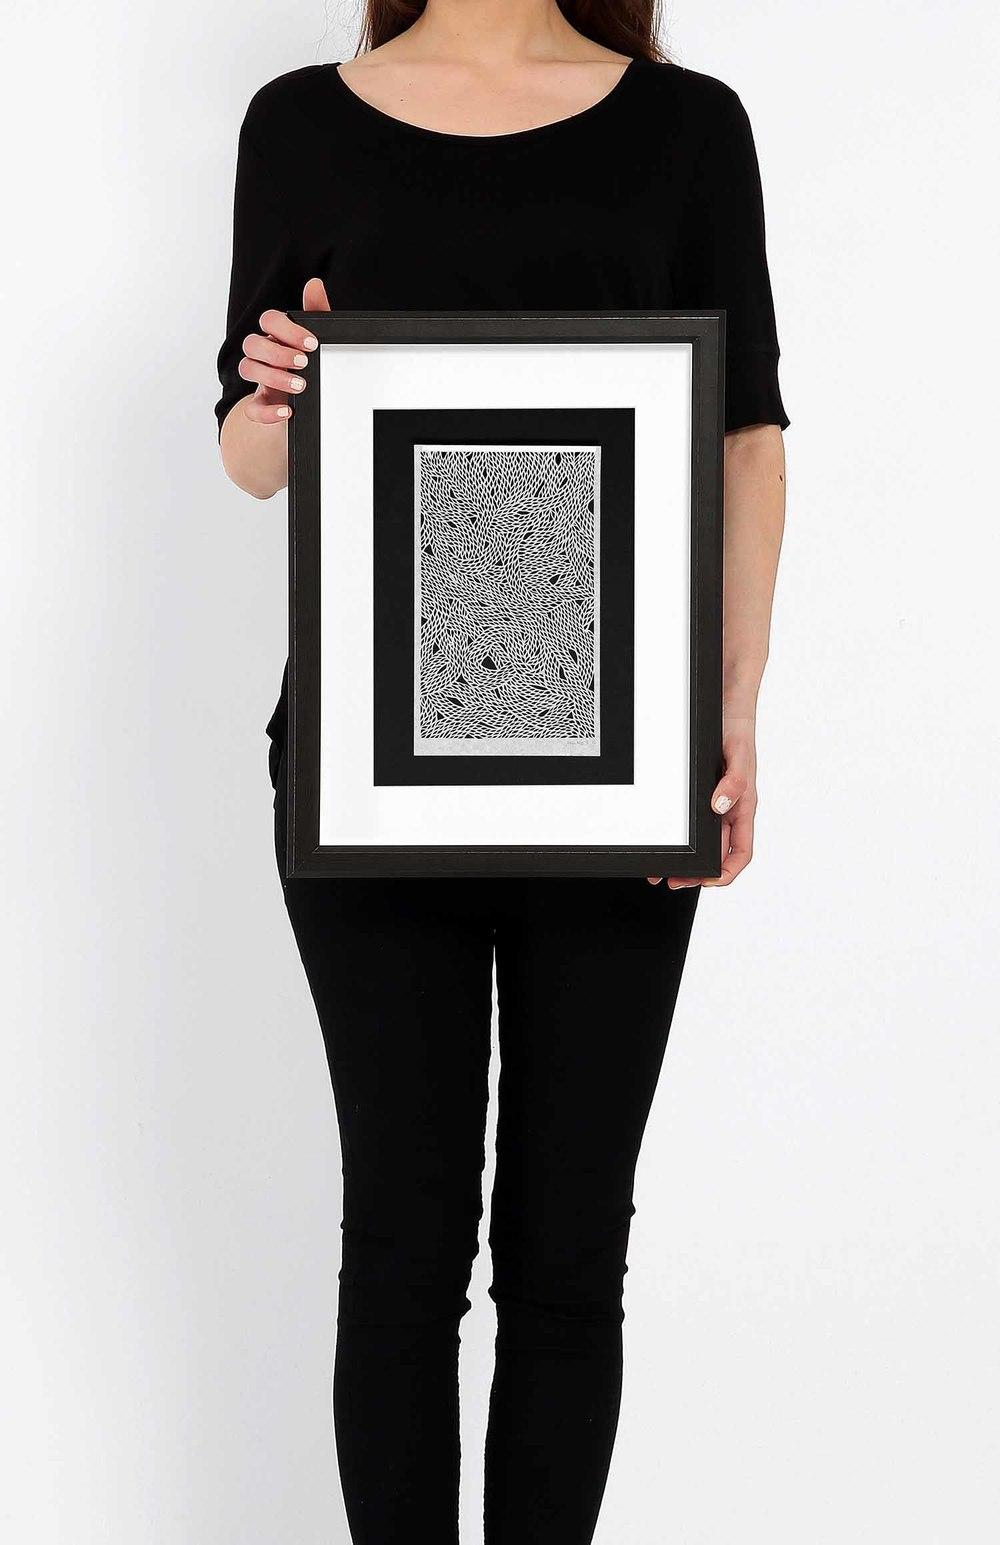 Untitled Black Threads Small on Black_Framed.jpg